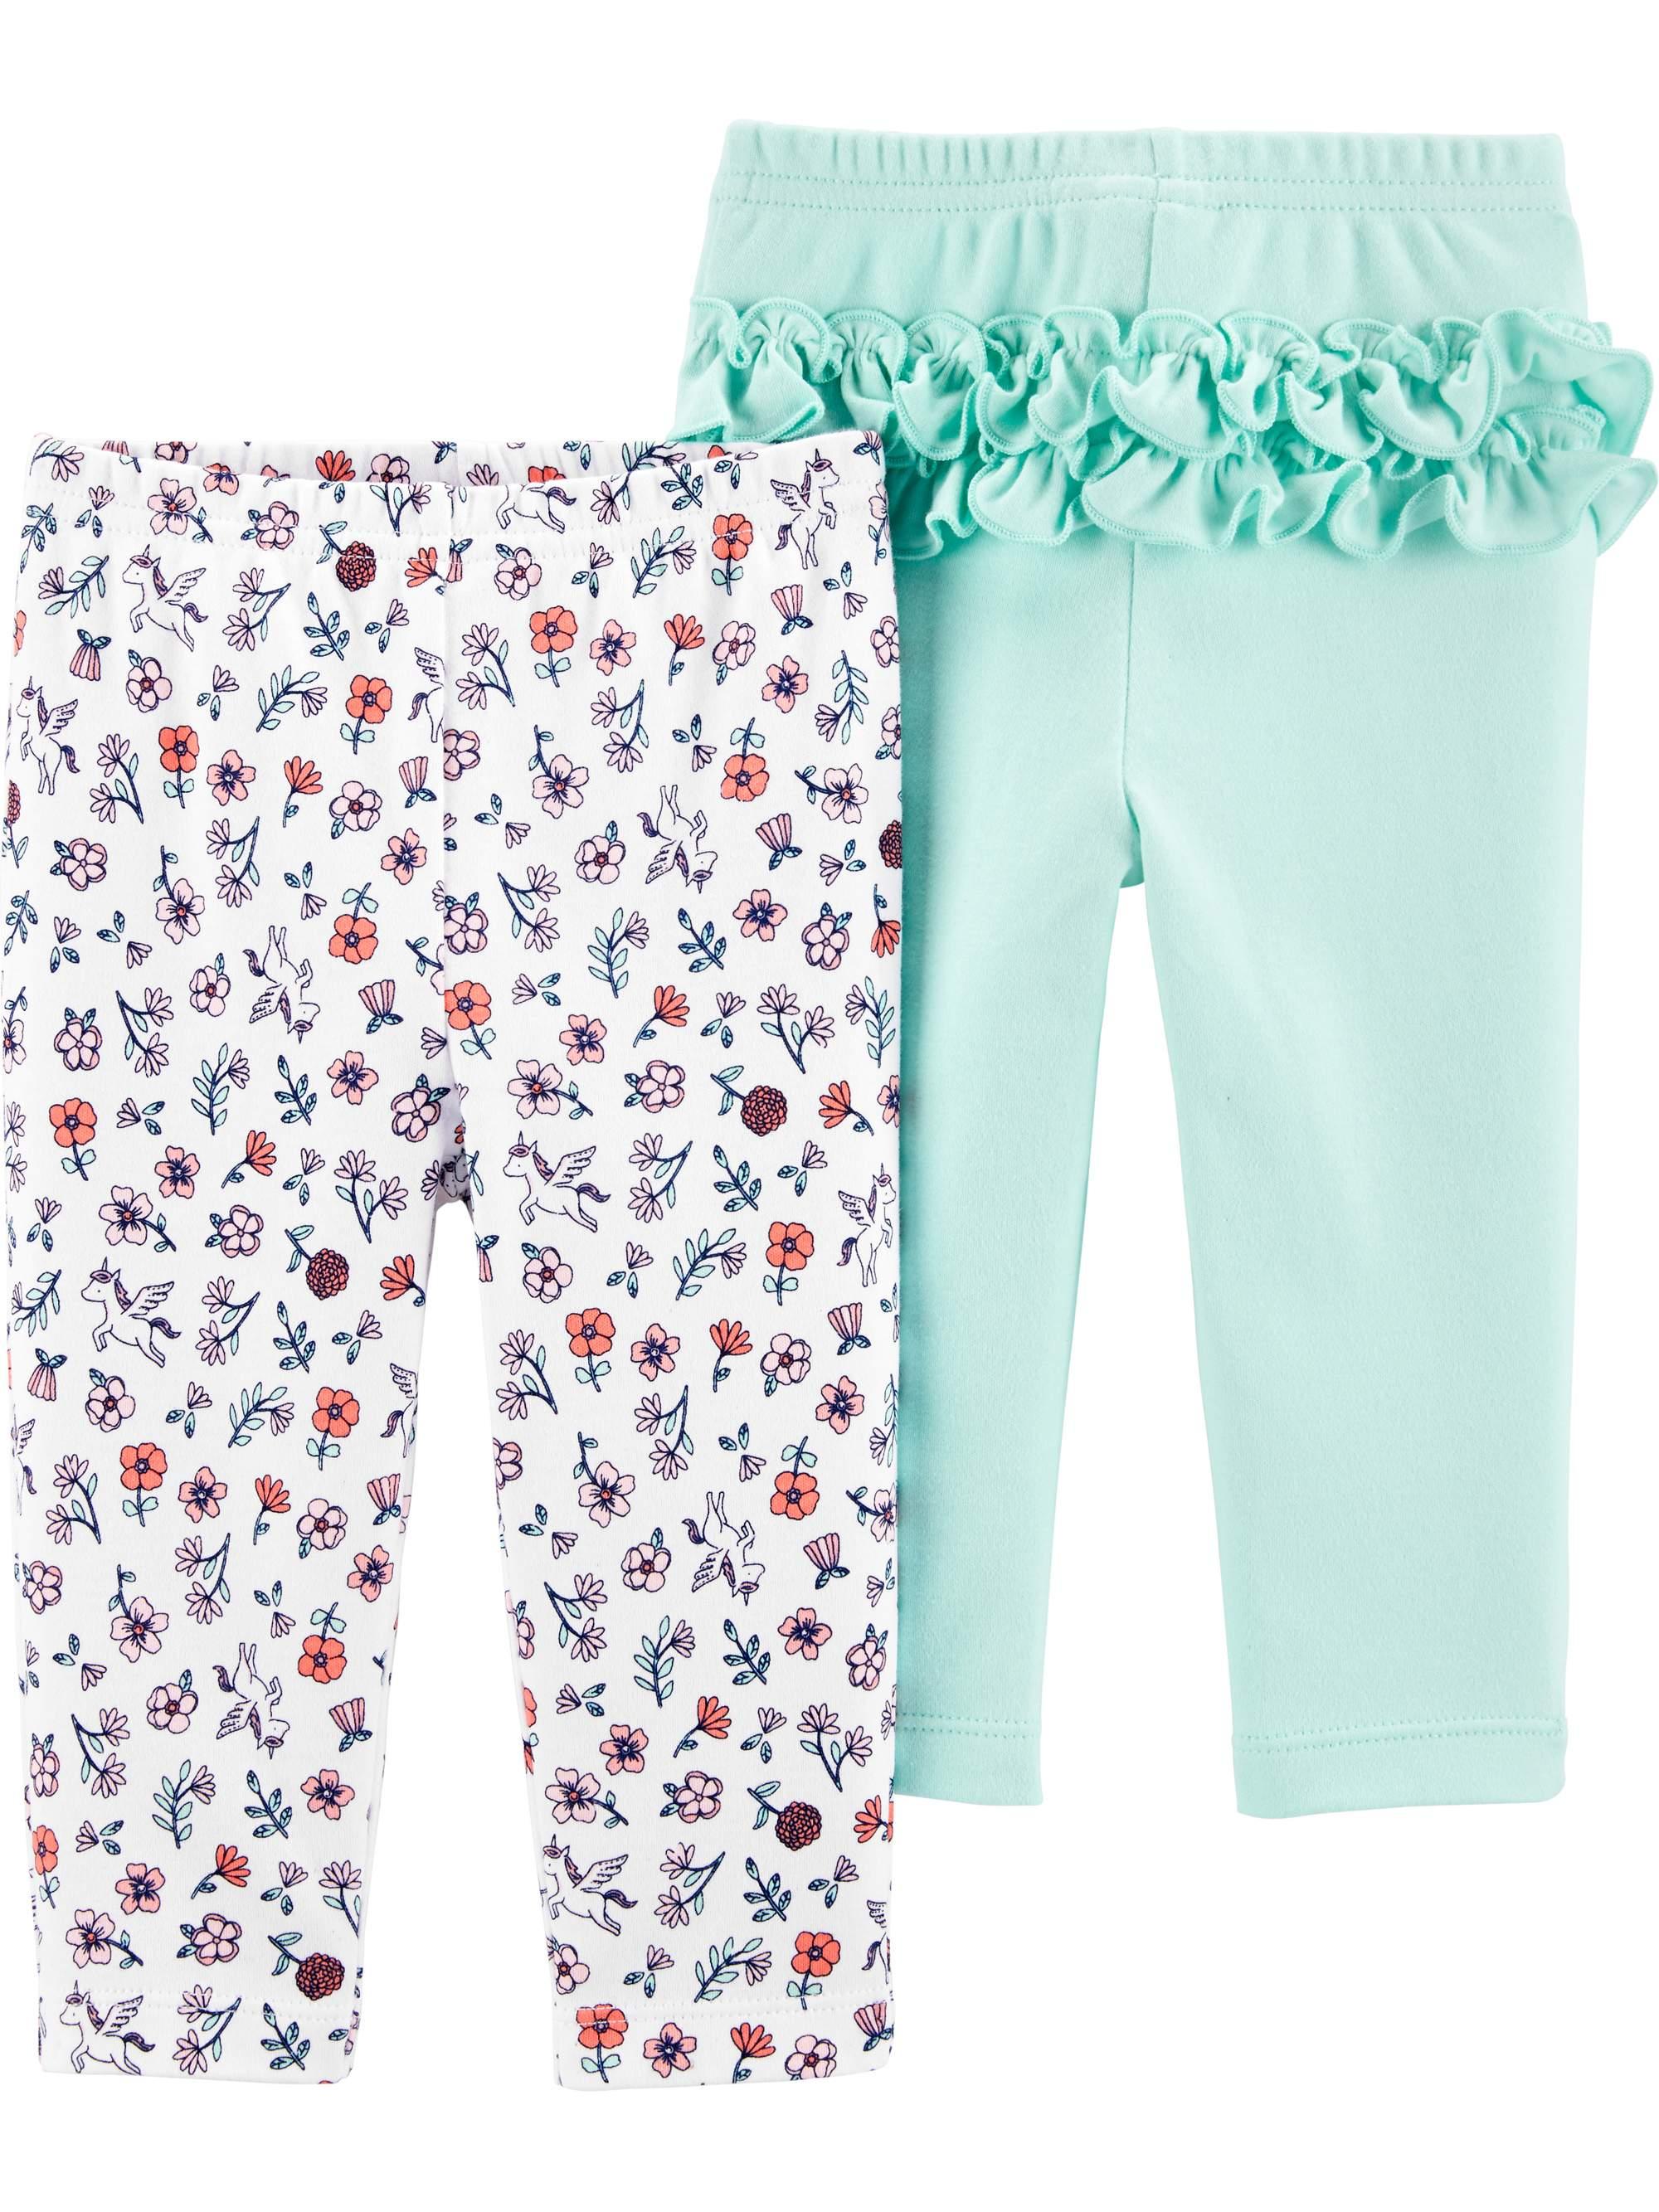 Long Leg Pant, 2 pack (Baby Girls)